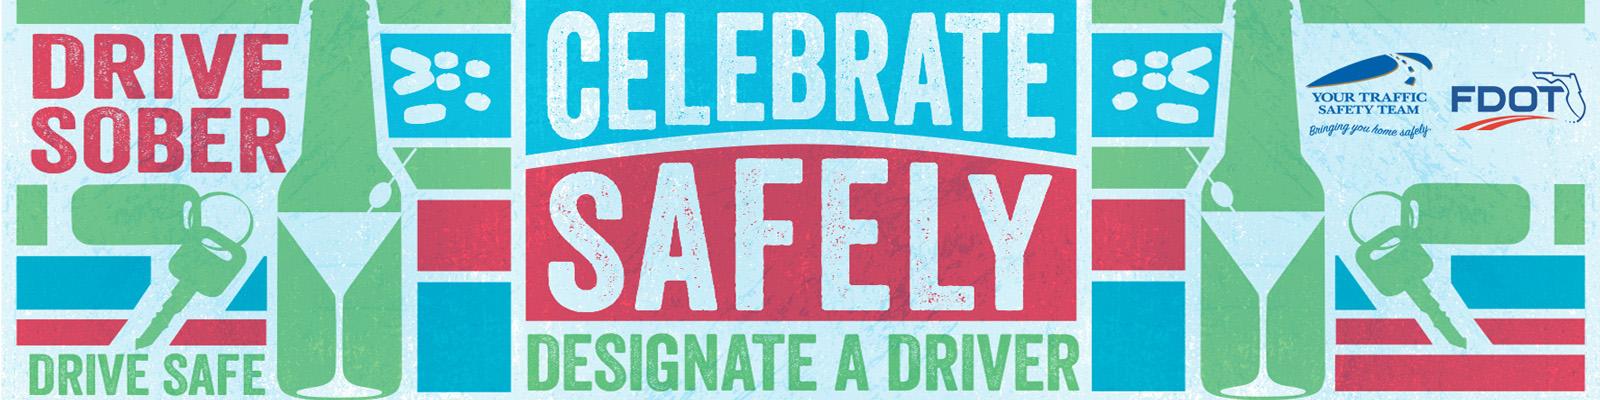 Celebrate Safely, Designate a Driver